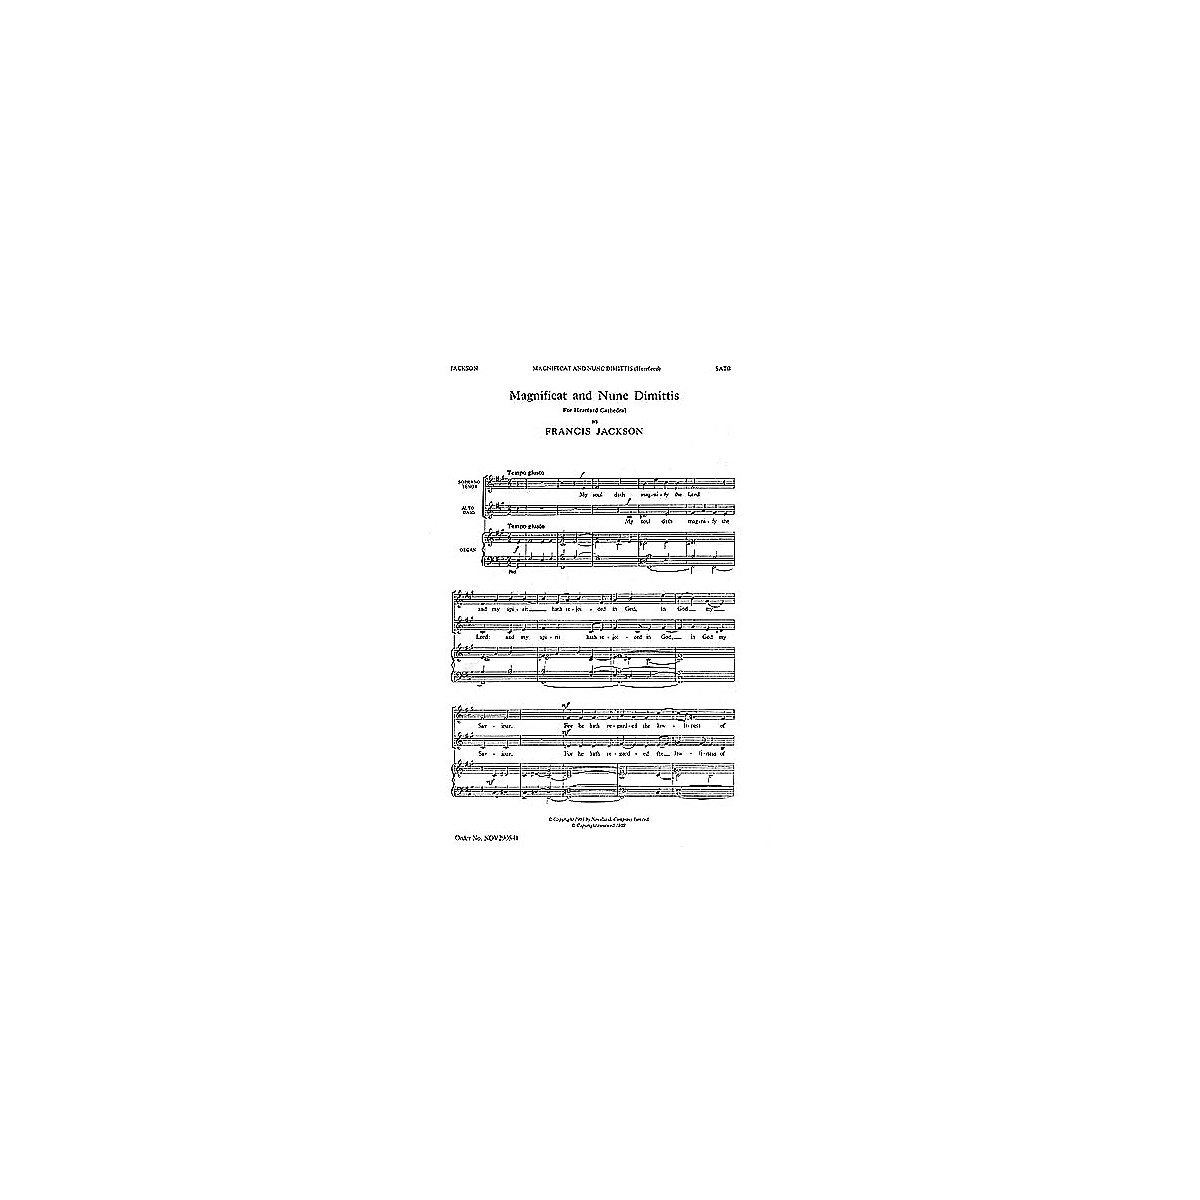 Novello Magnificat and Nunc Dimittis (Hereford) SATB